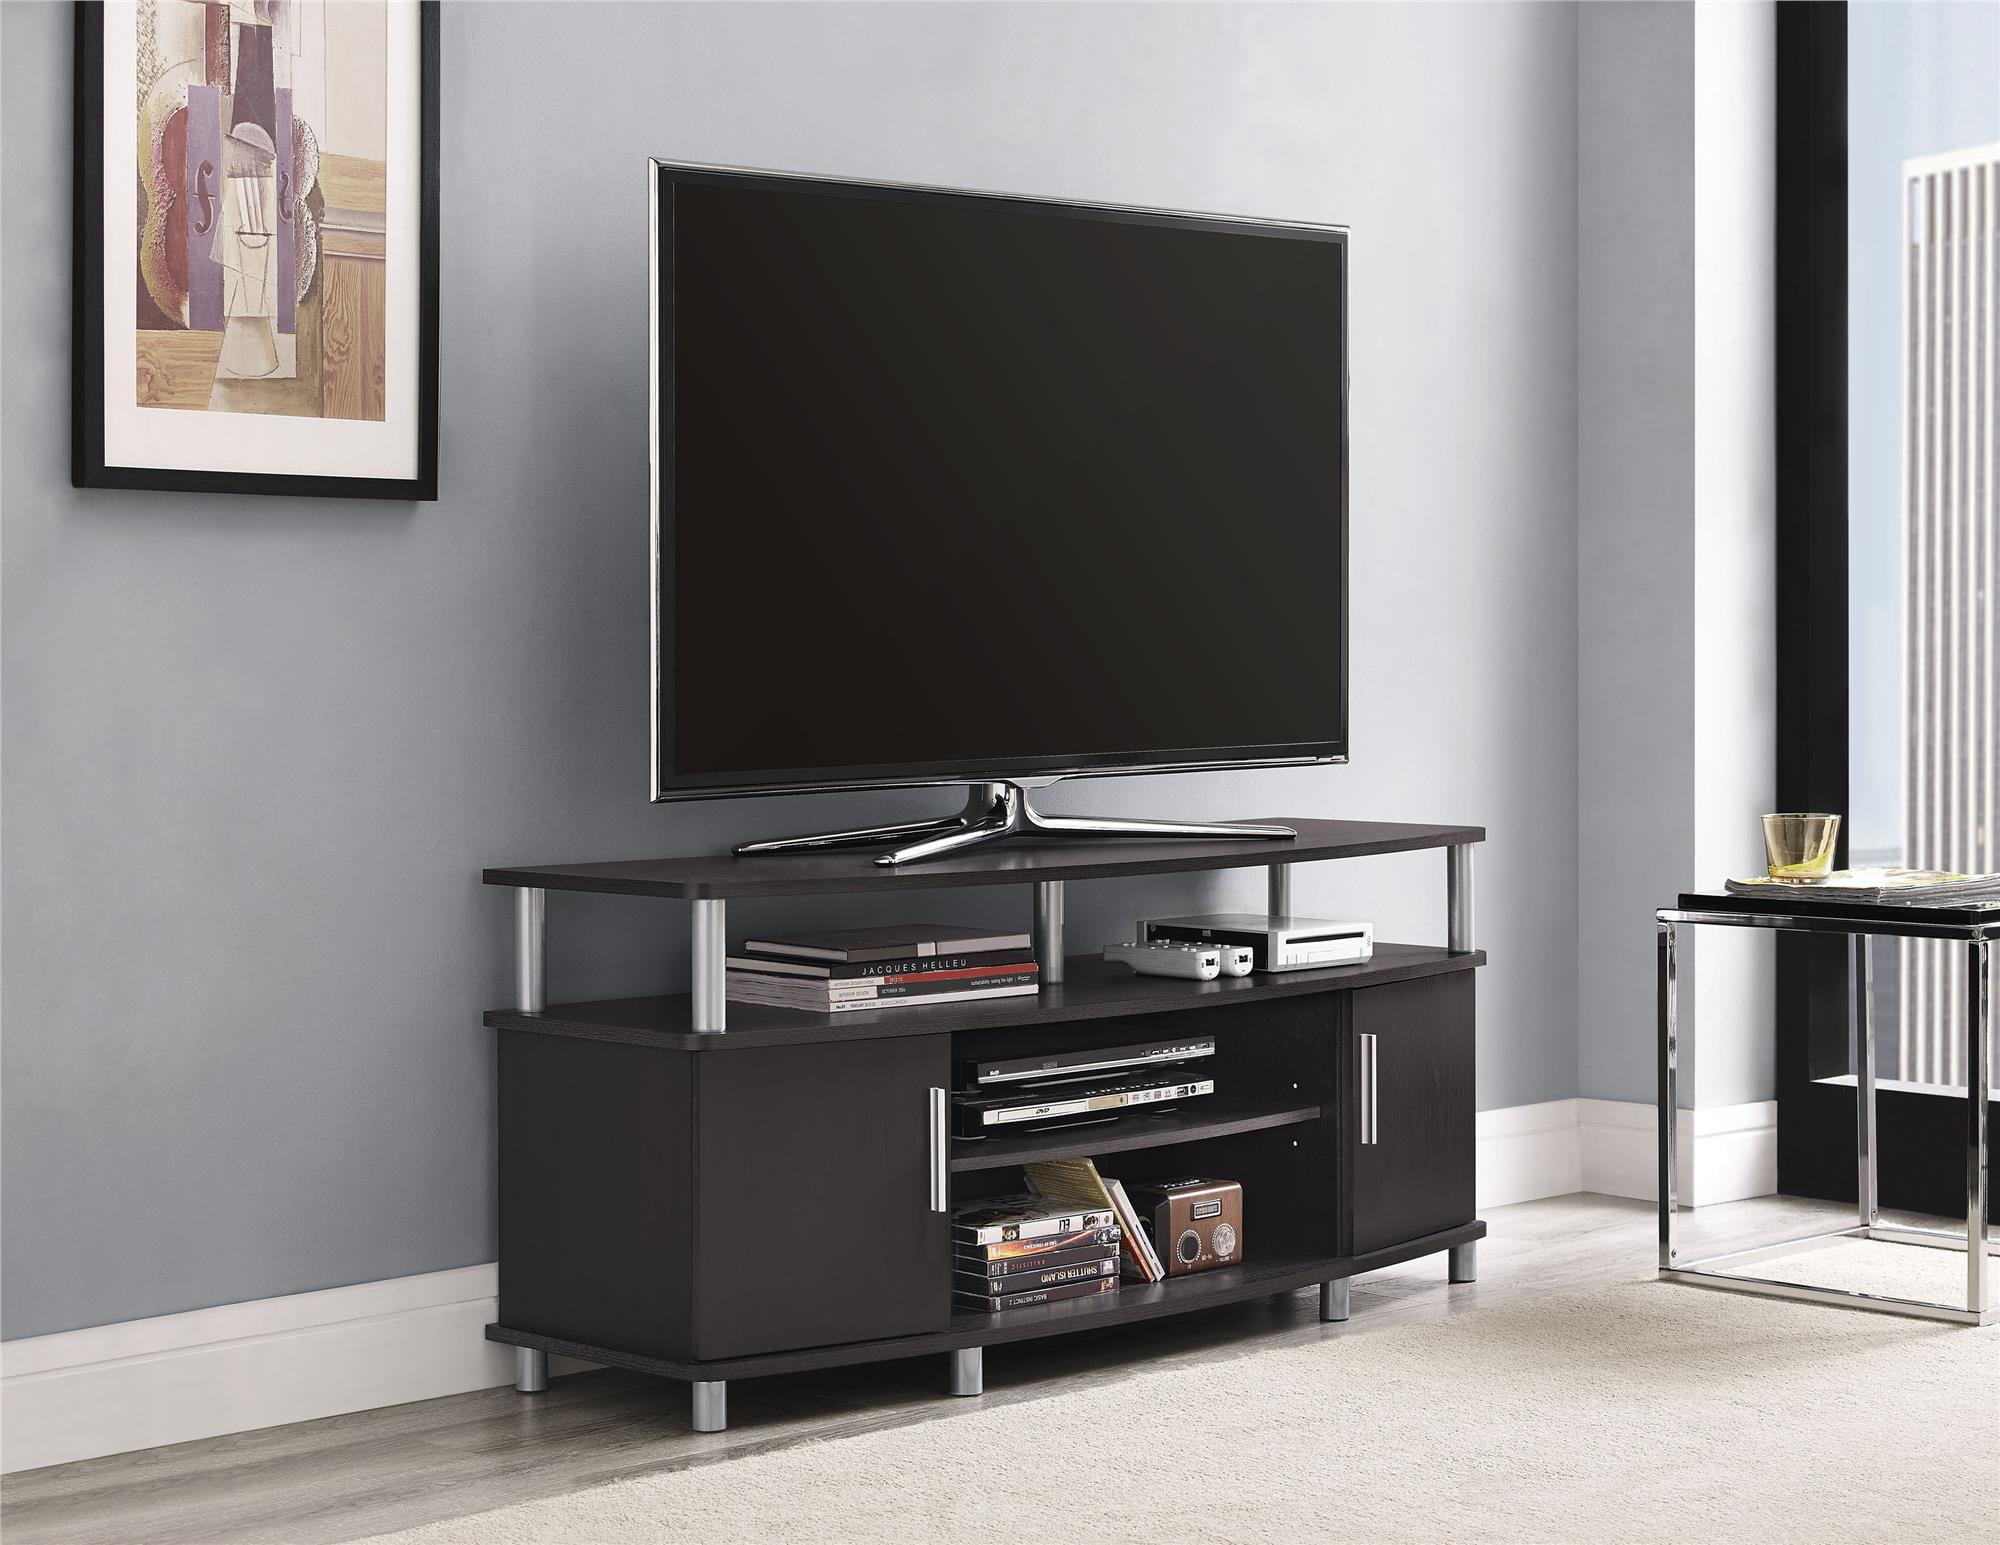 Carson Tv Stand For Tvs Up To 50 Multiple Finishes Espresso Walmart Com Walmart Com